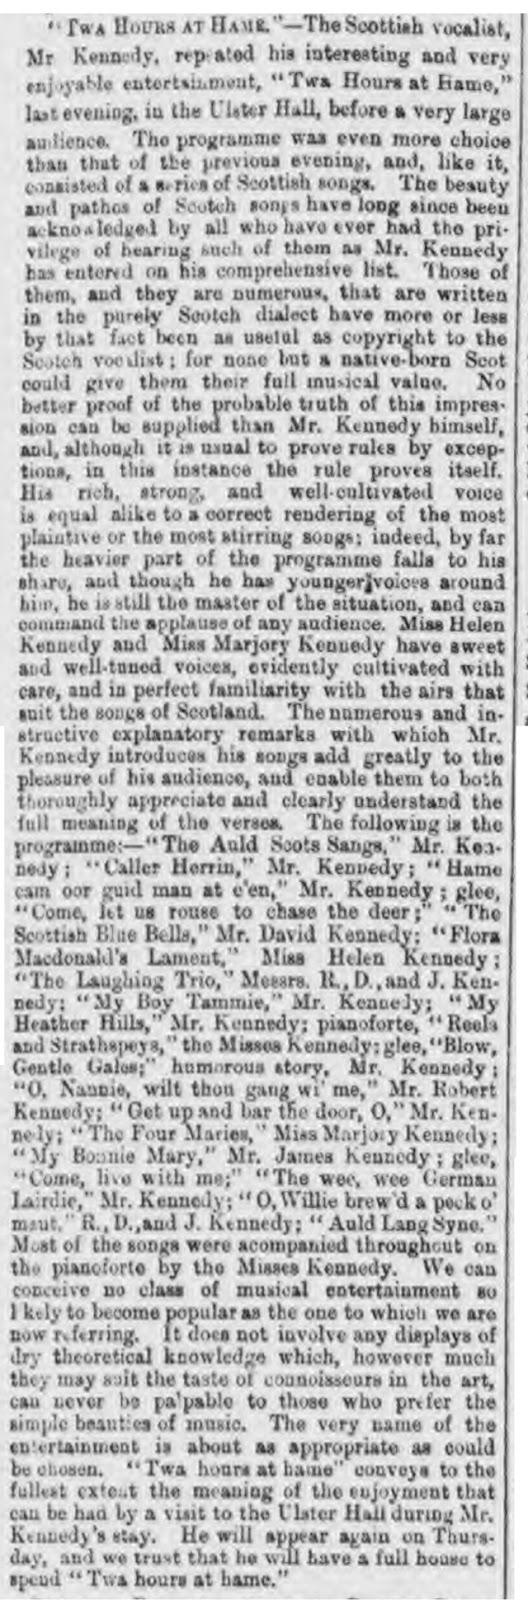 Twa Hours at Hame 1877